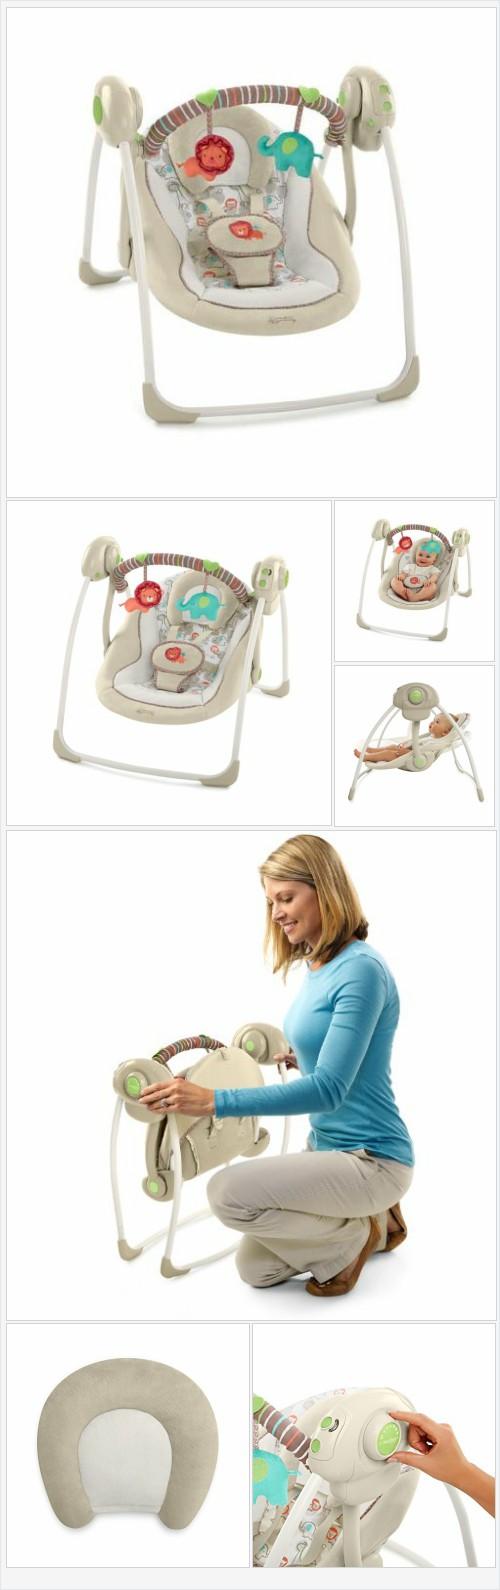 Comfort & Harmony Cozy Kingdom Portable Swing Every